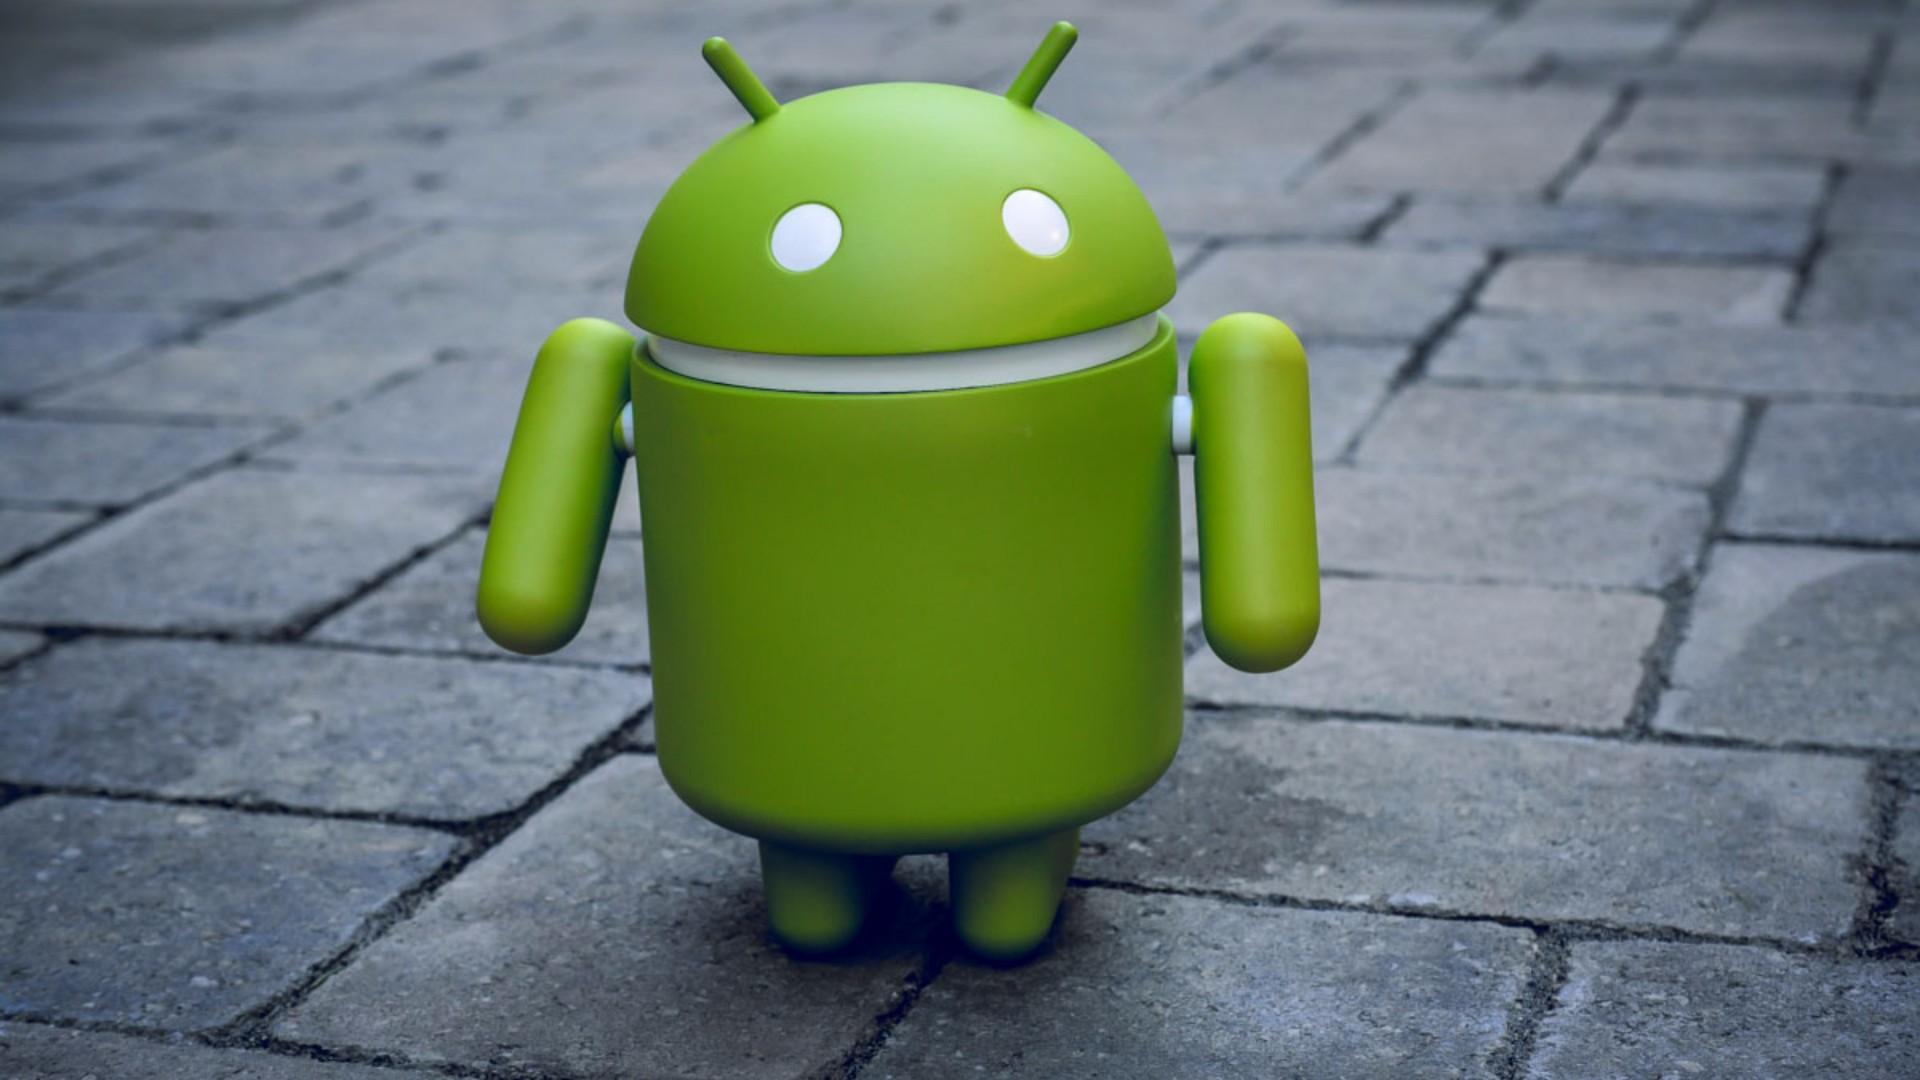 android ve ios uygulamadan para kazanma, uygulamalar ile para kazanma, cep telefonu uygulamalarından para kazanma